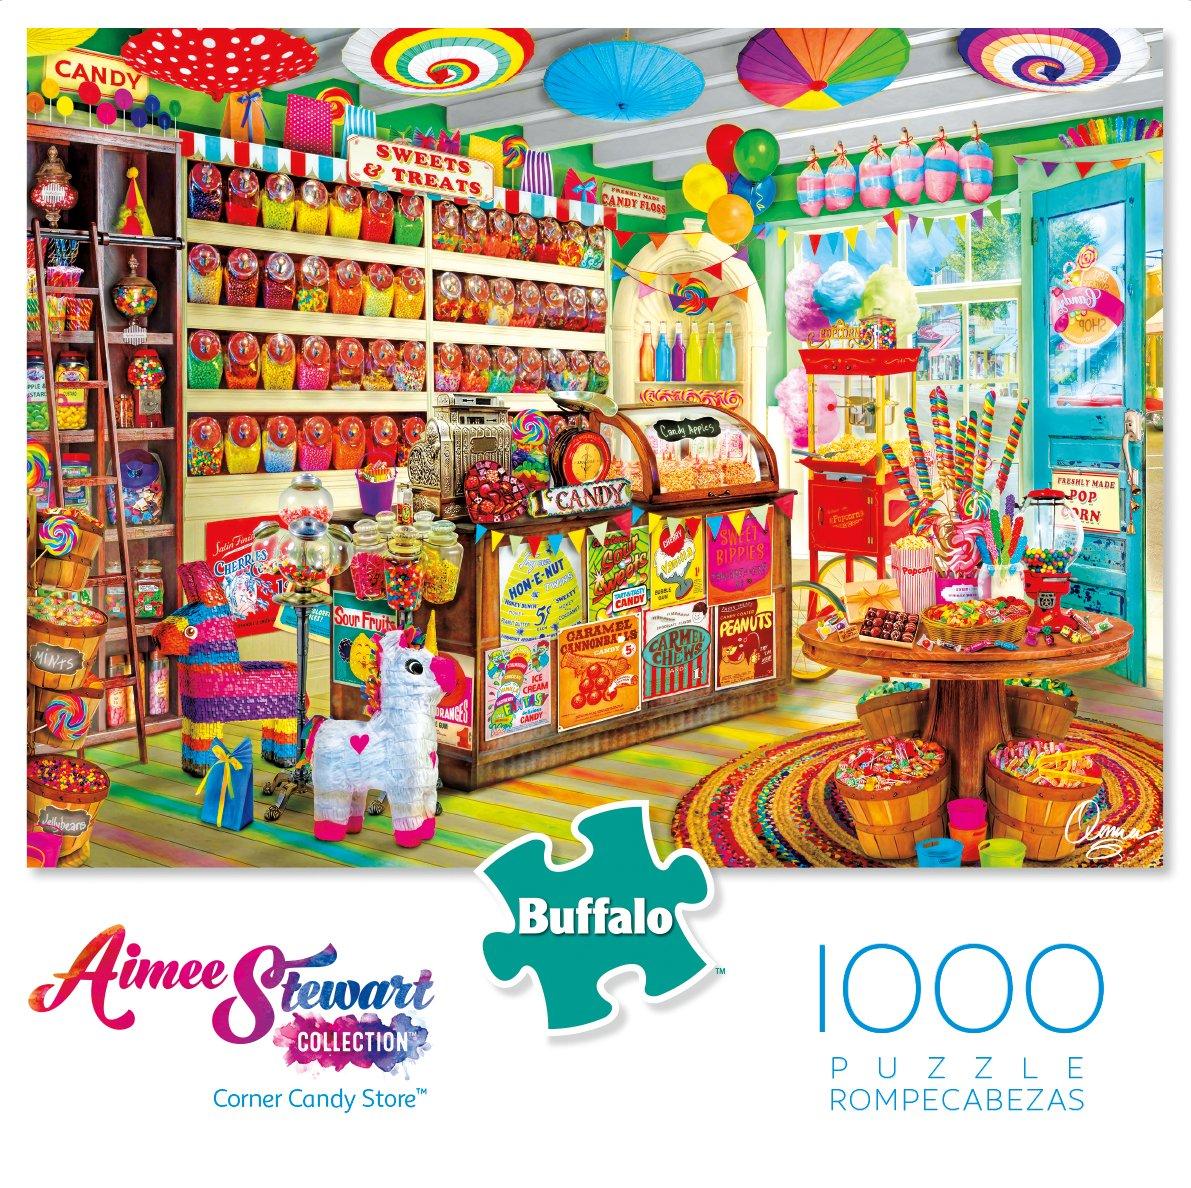 1000 Piece Jigsaw 11747 Corner Candy Store Aimee Stewart Buffalo Games